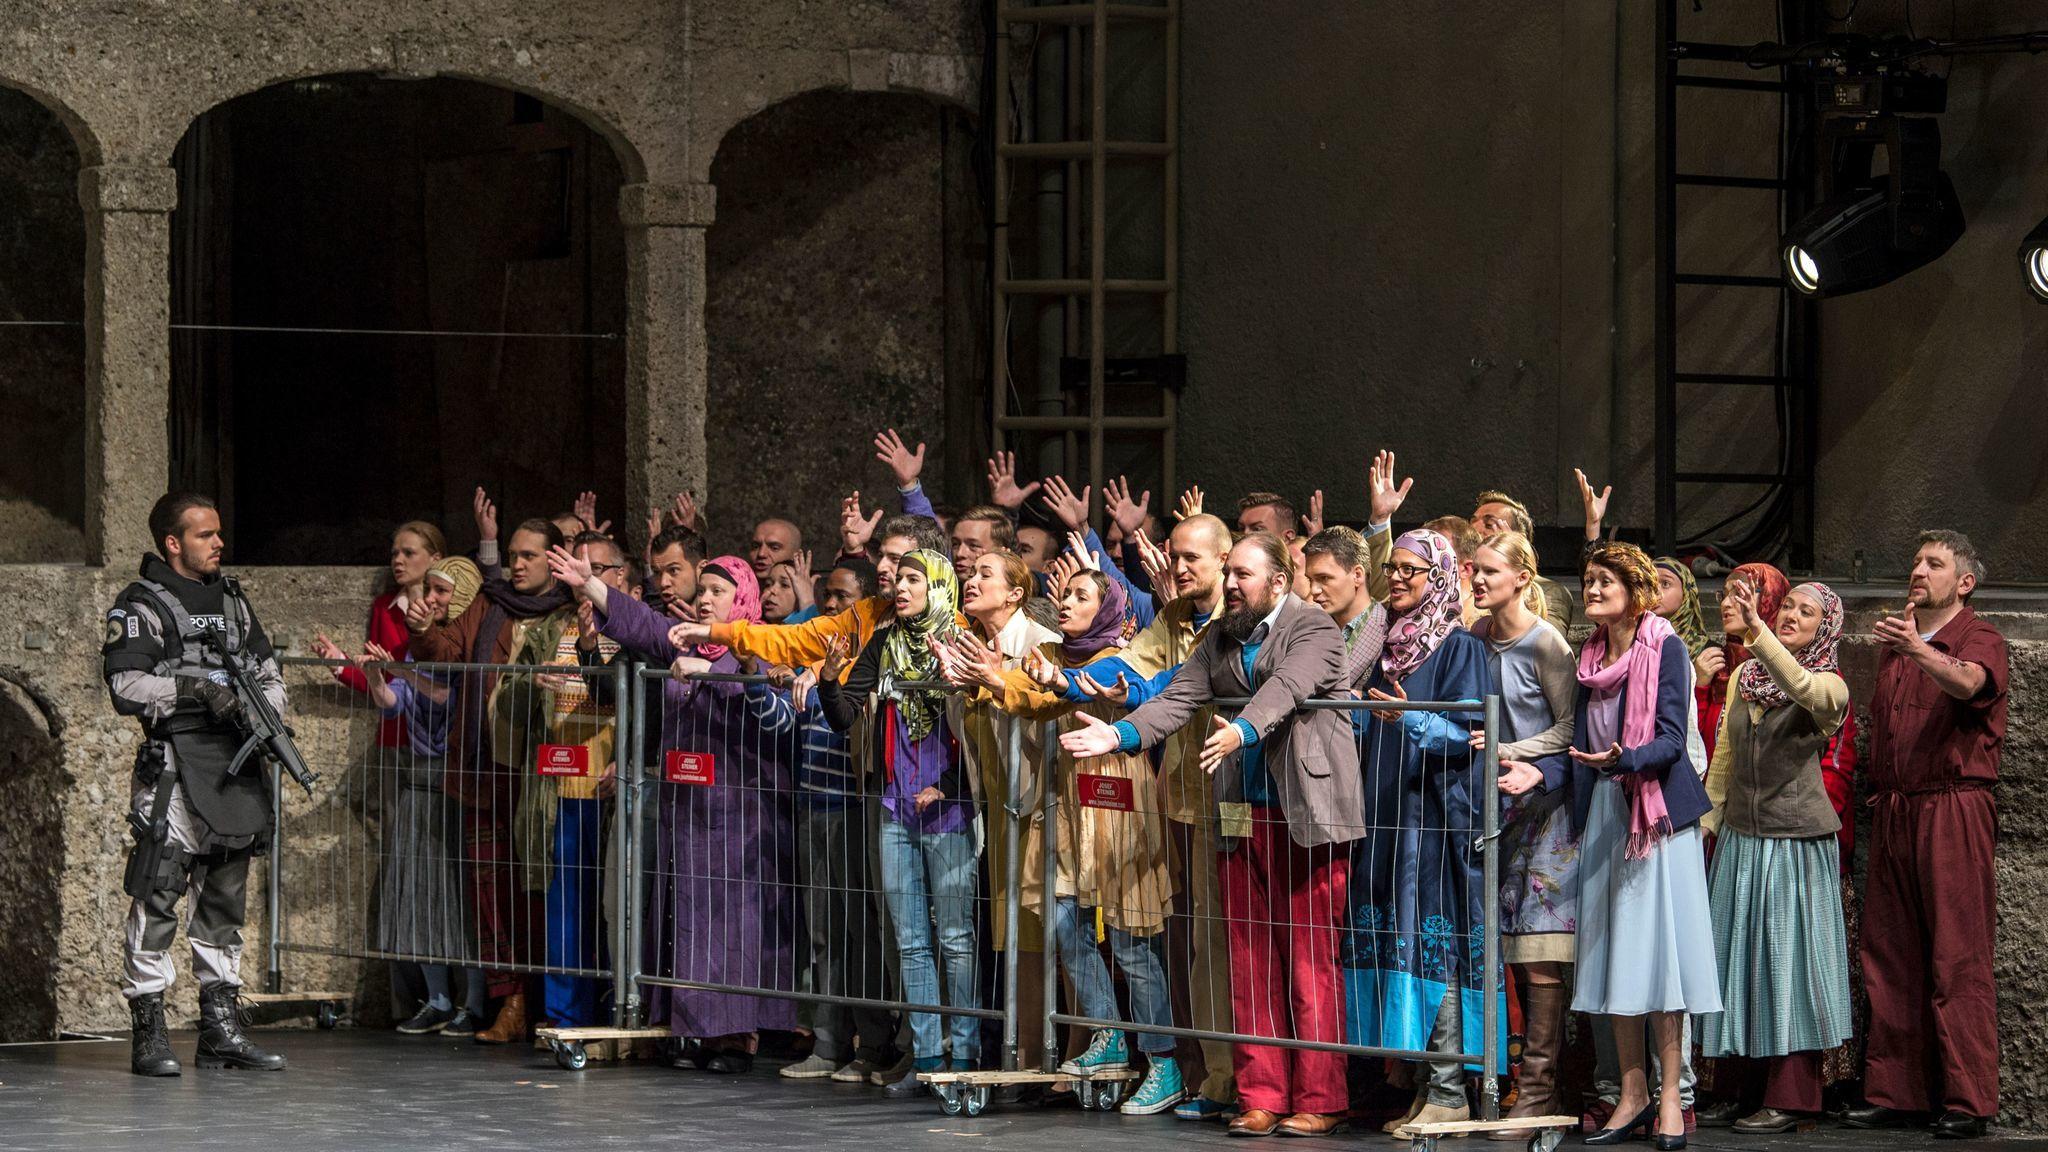 Peter Sellars' Salzburg Festival production of Mozart's